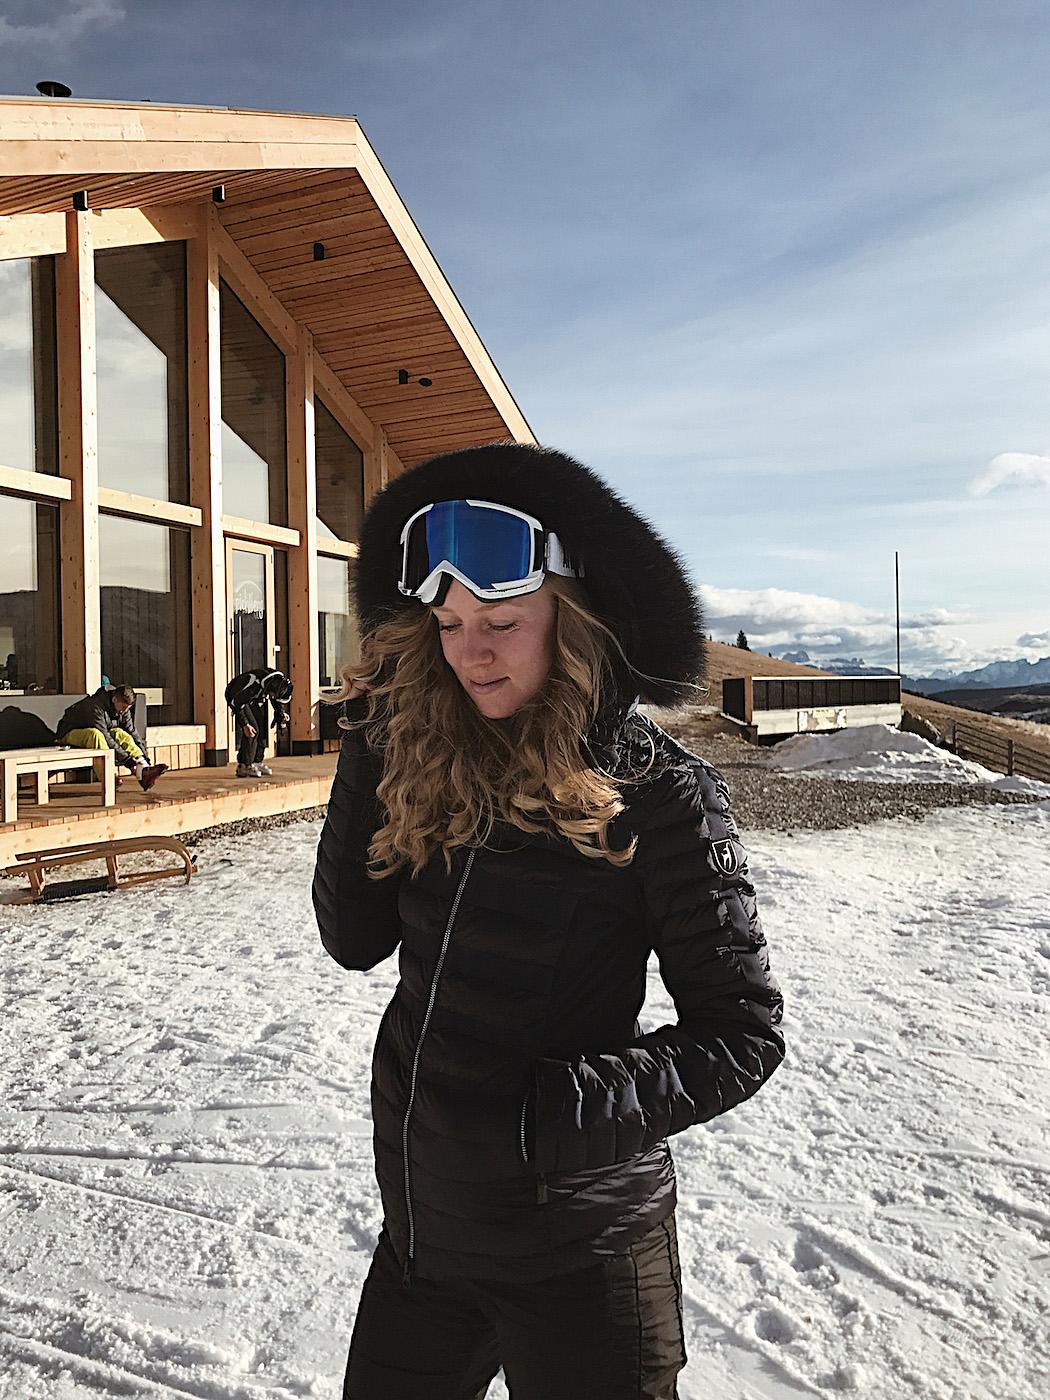 skiwoche südtirol _ winterholidays south tyrol - winterferien südtirol, skifahren reinswald, sarntal